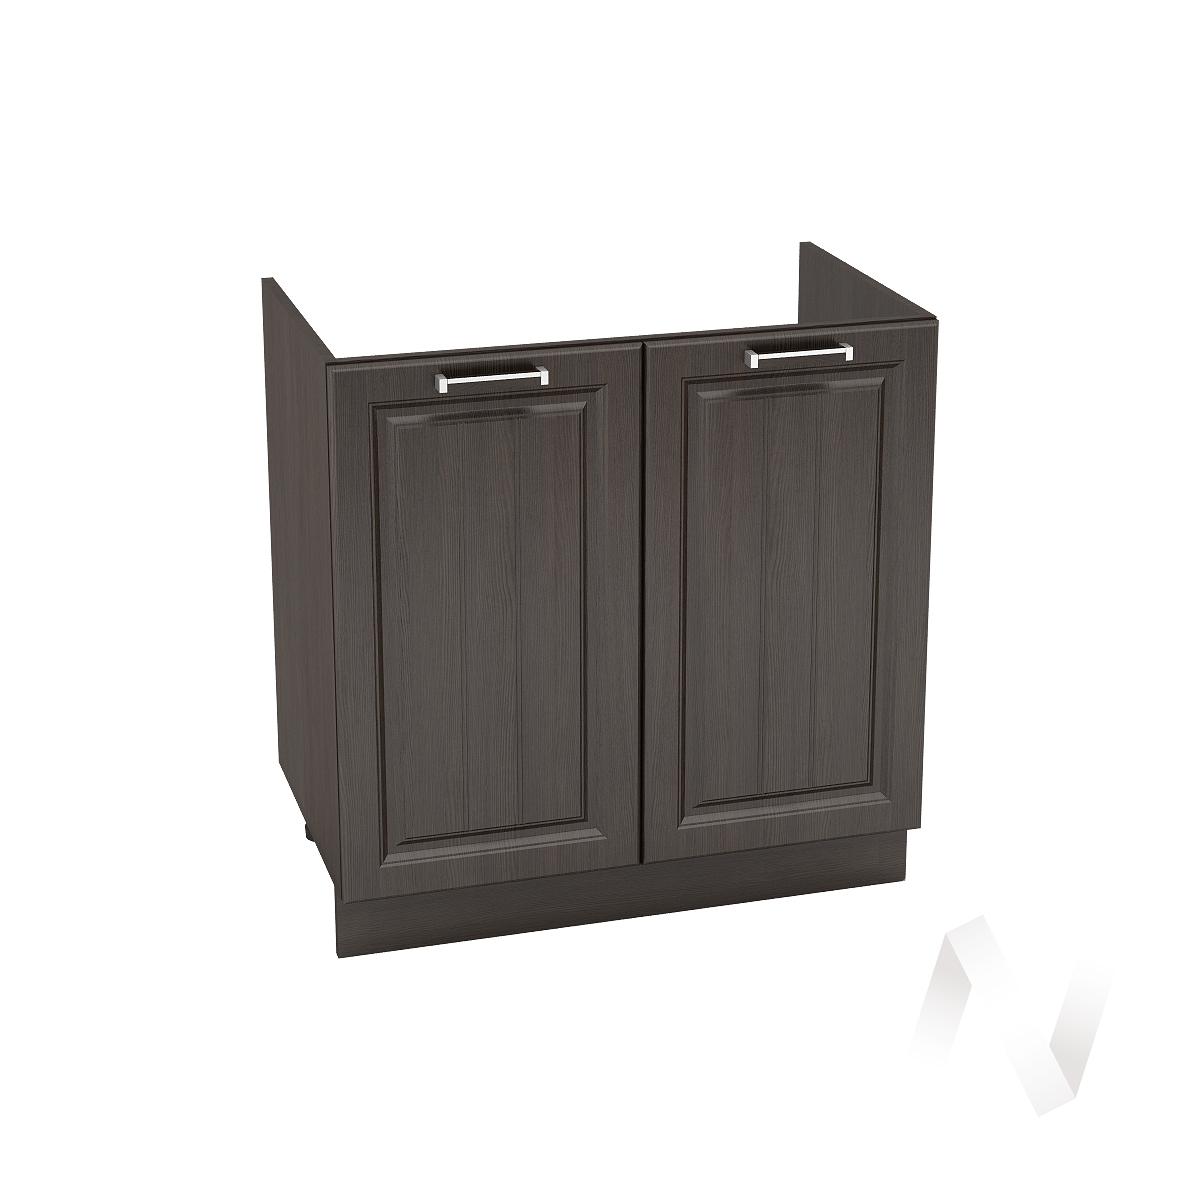 "Кухня ""Прага"": Шкаф нижний под мойку 800, ШНМ 800 (венге/корпус венге)"